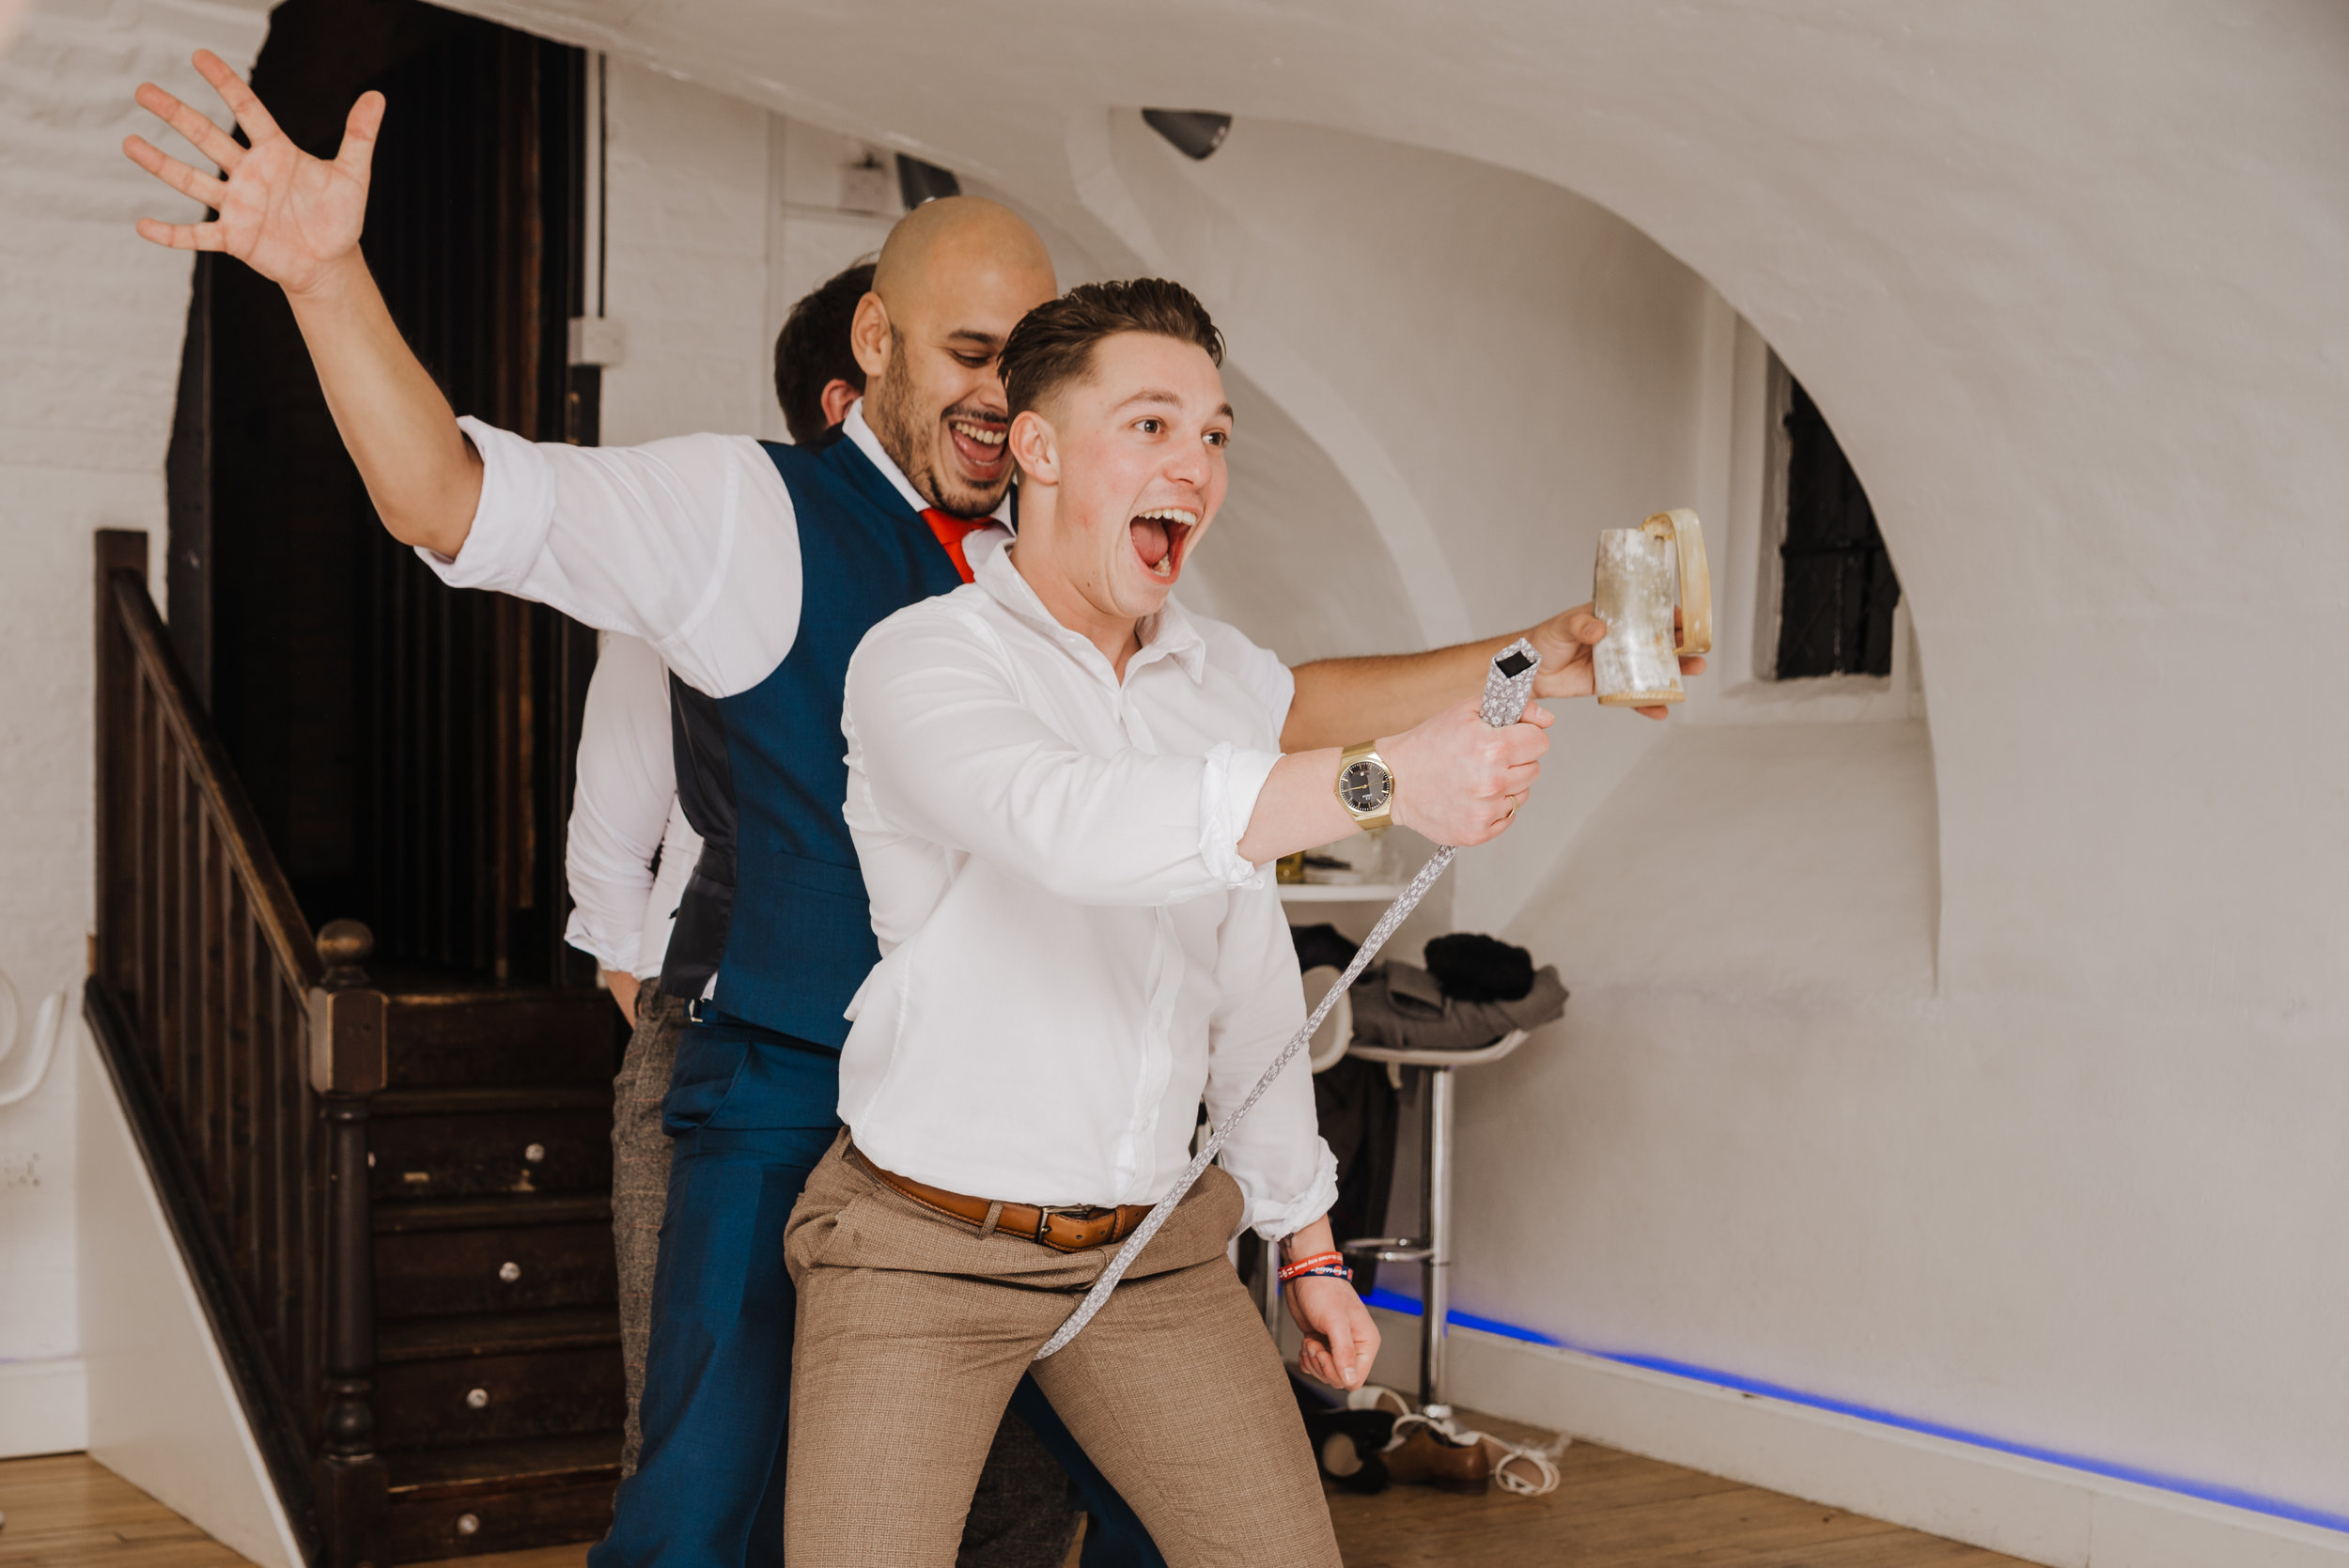 Konjo-Photography-Essex-Suffolk-Norfolk-Wedding-Photographer-And-Videographer-Wedding-Videography (13).jpg